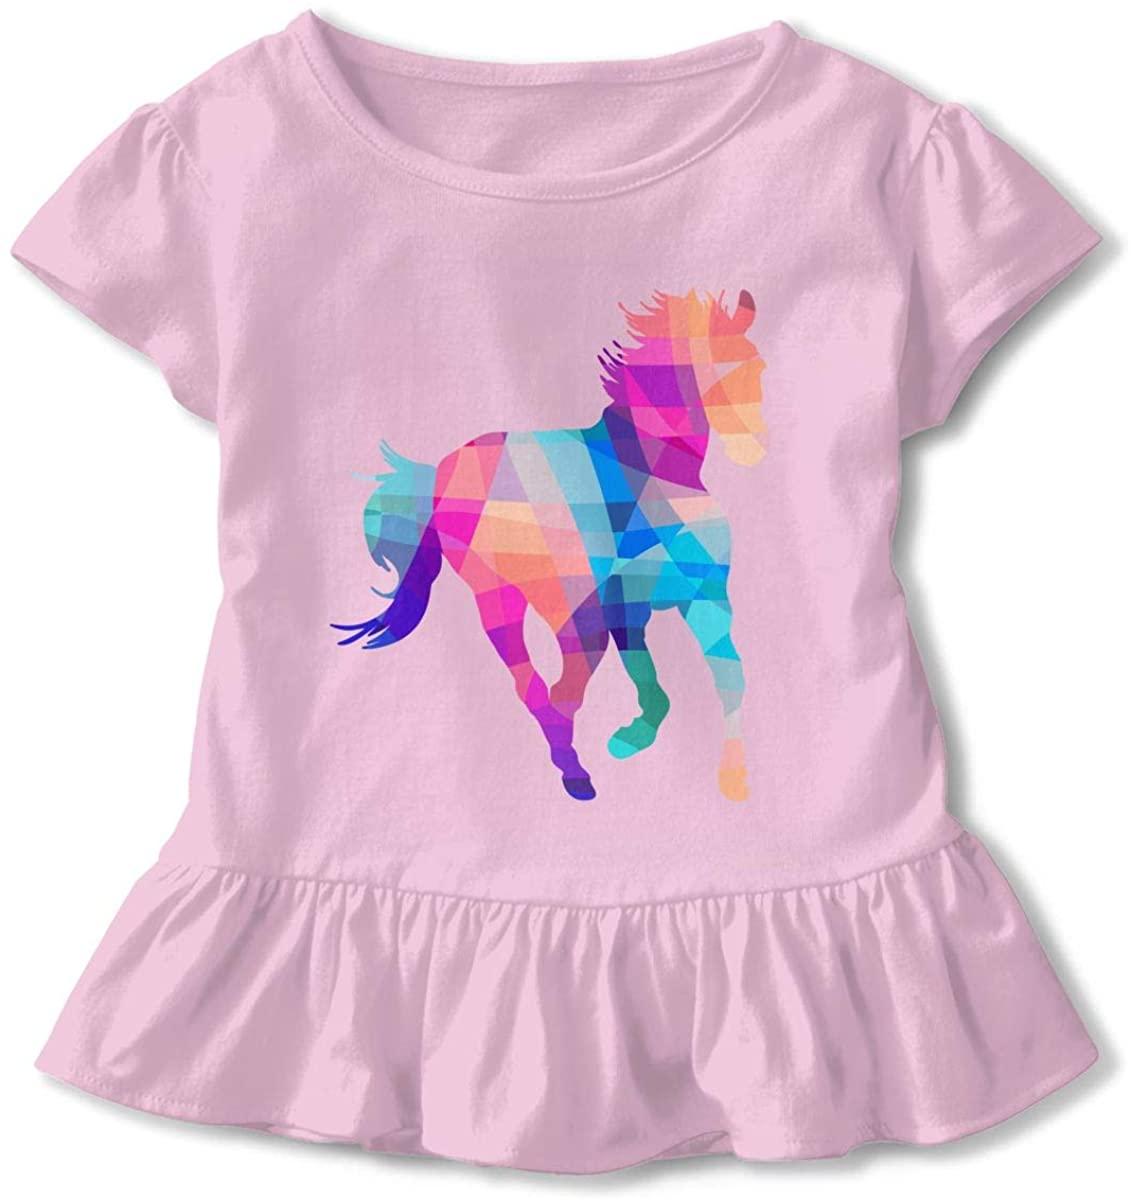 EASON-G Toddler Girl's Ruffle T-Shirt Colorful Horse Short Sleeve 2-6T